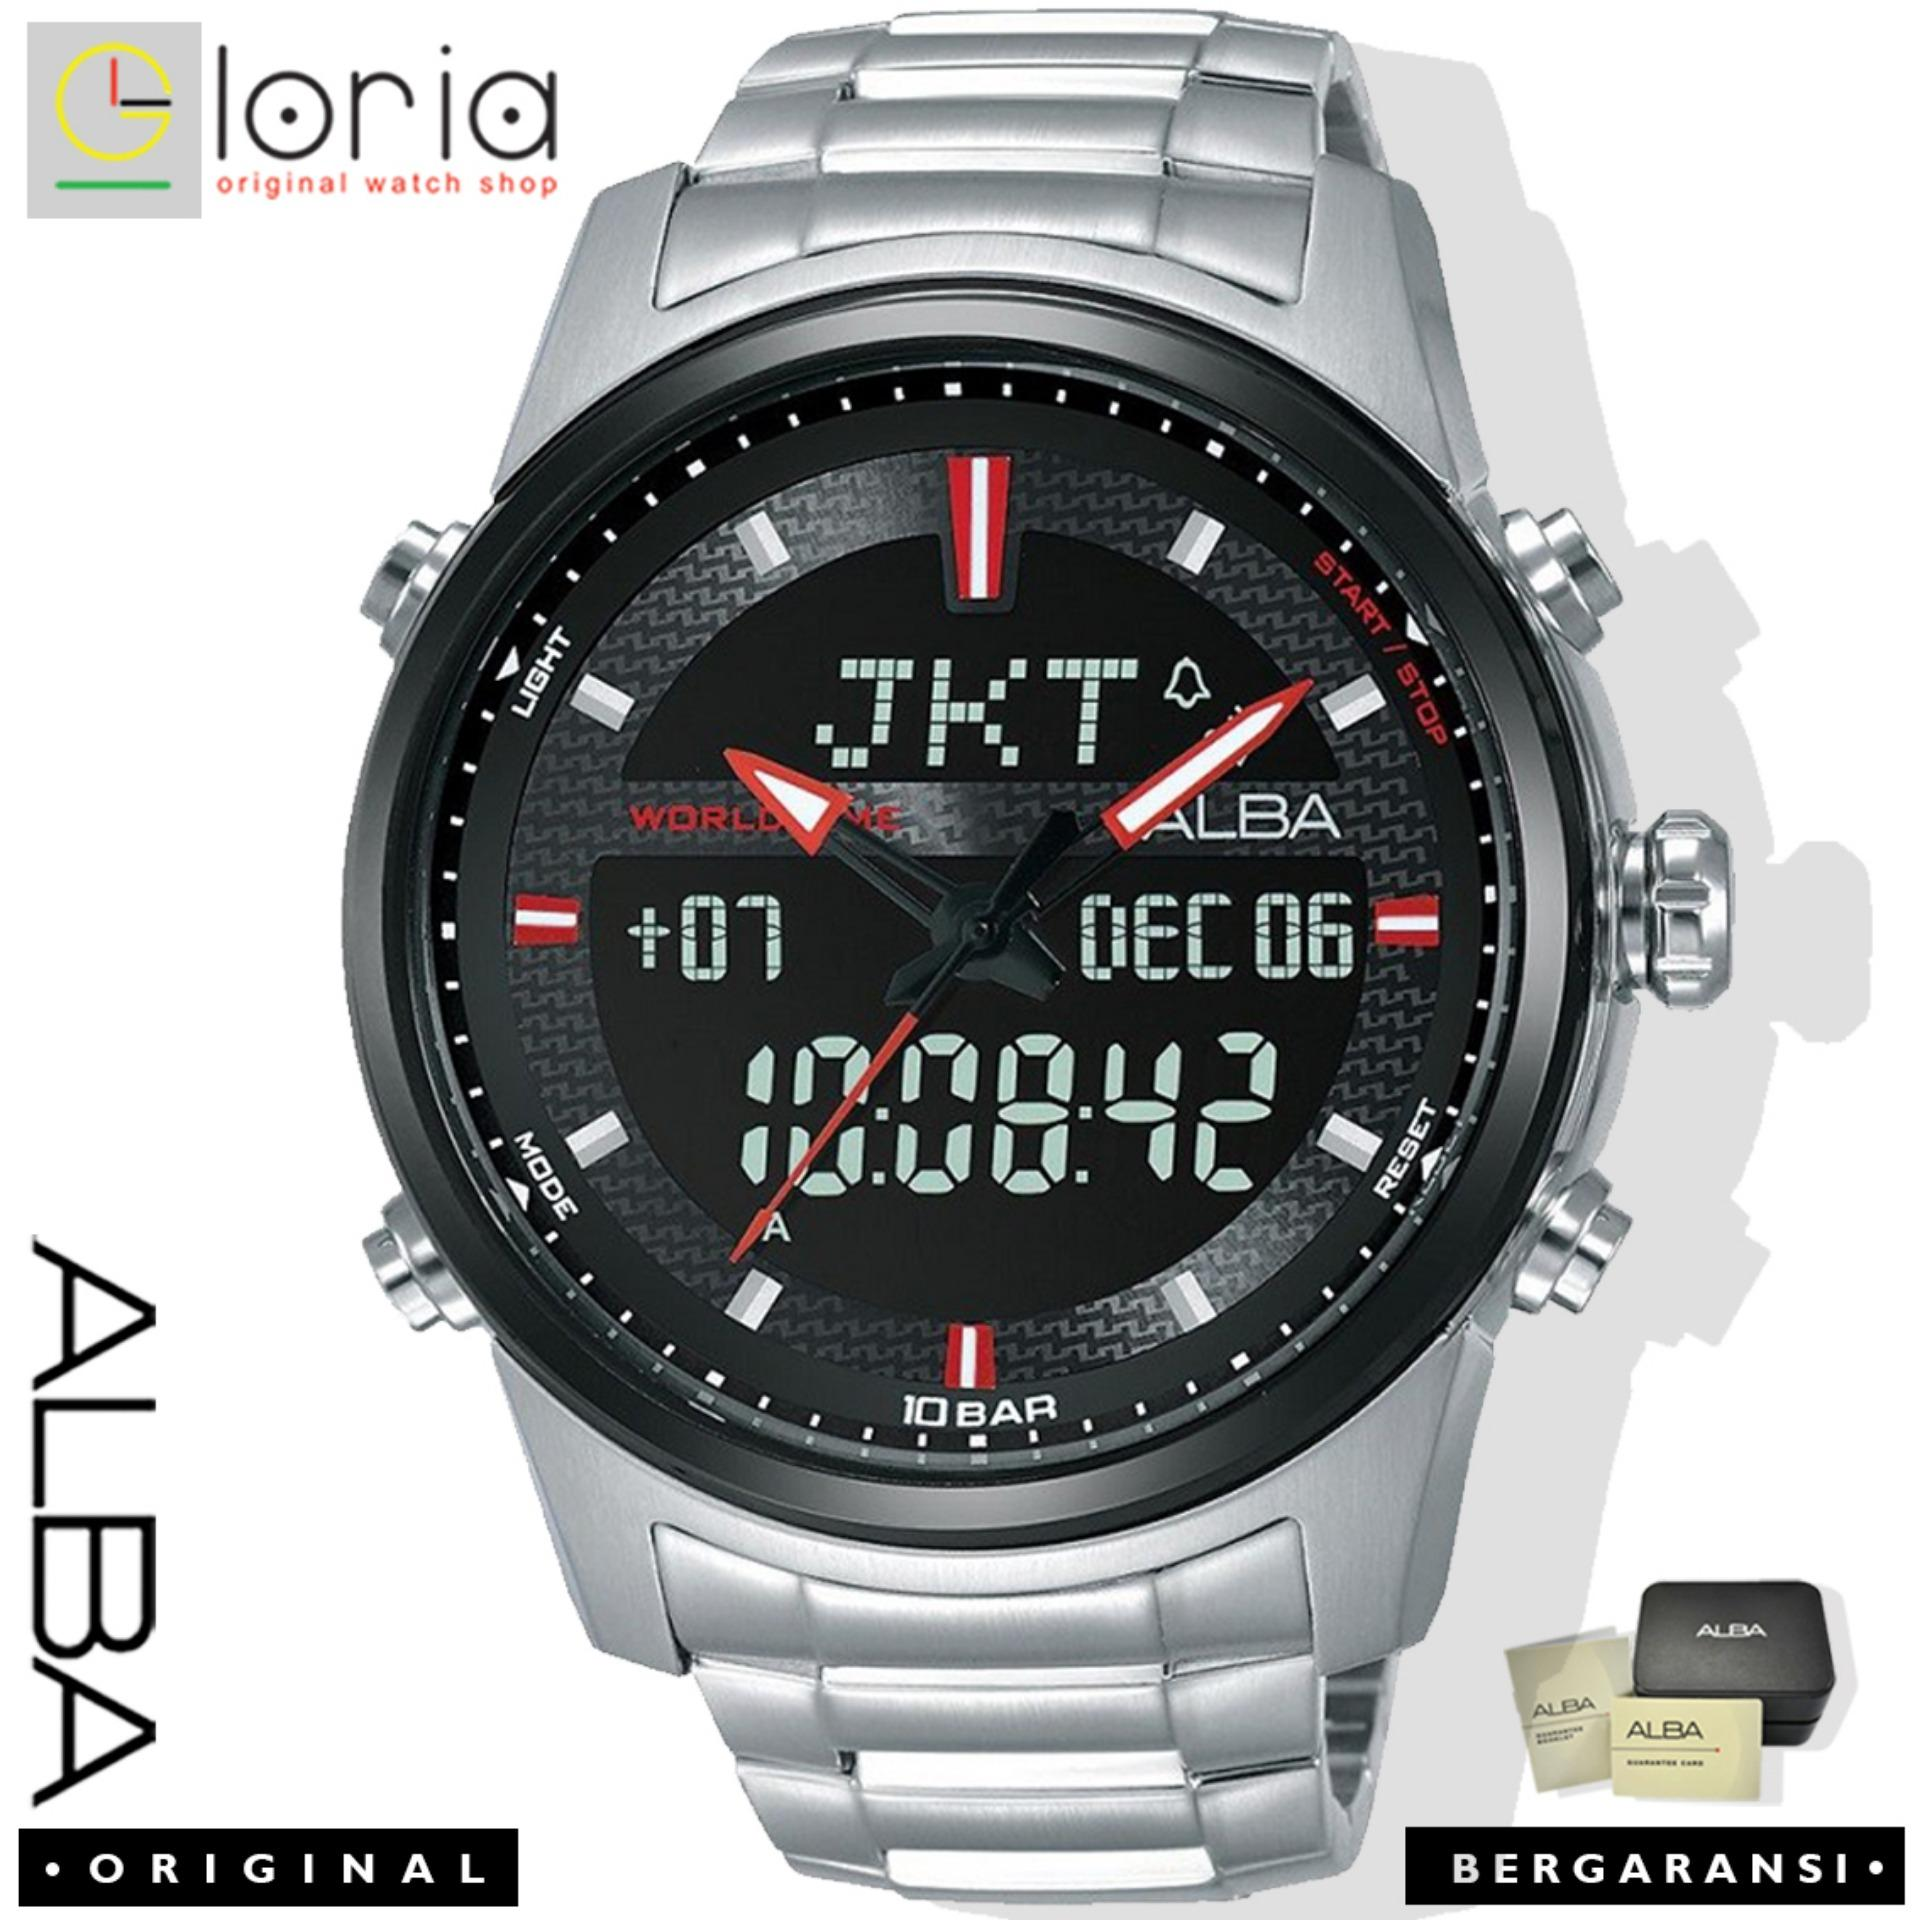 Alba AZ40 Series Jam Tangan Pria Dual Time Digital Analog Tali Stainless    Nylon   Kulit 2737fc0b28